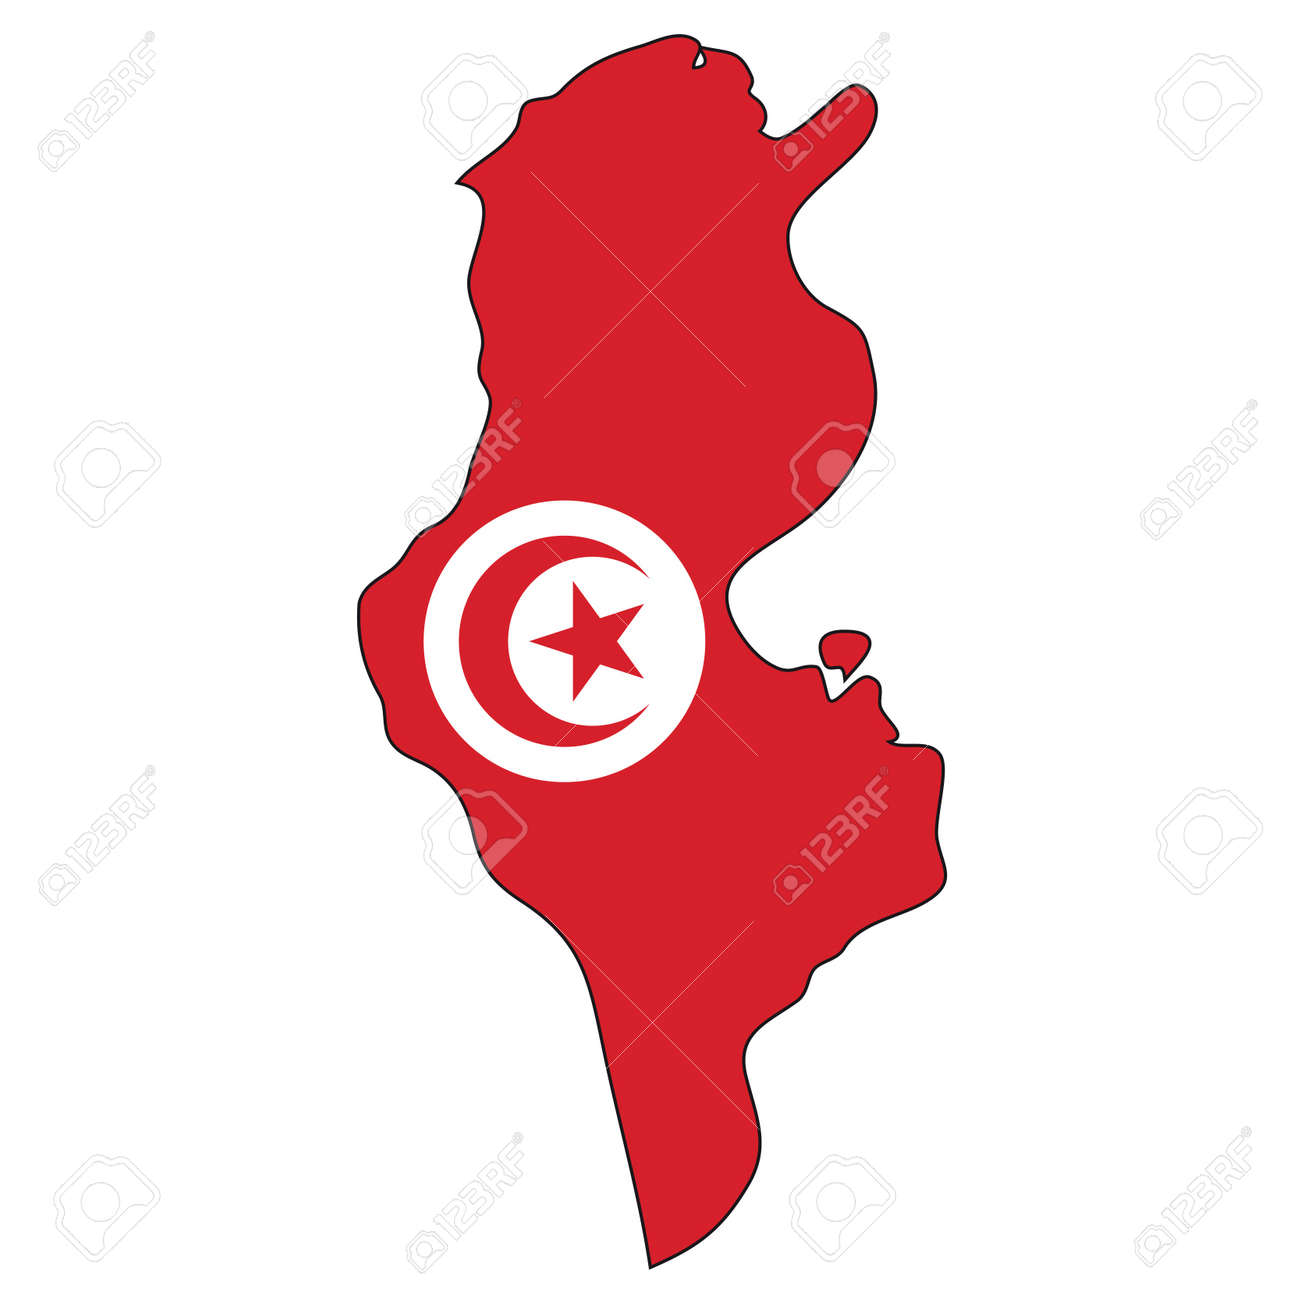 http://previews.123rf.com/images/robodread/robodread1109/robodread110901486/10648668-Karte-Flagge-Tunesien-Lizenzfreie-Bilder.jpg